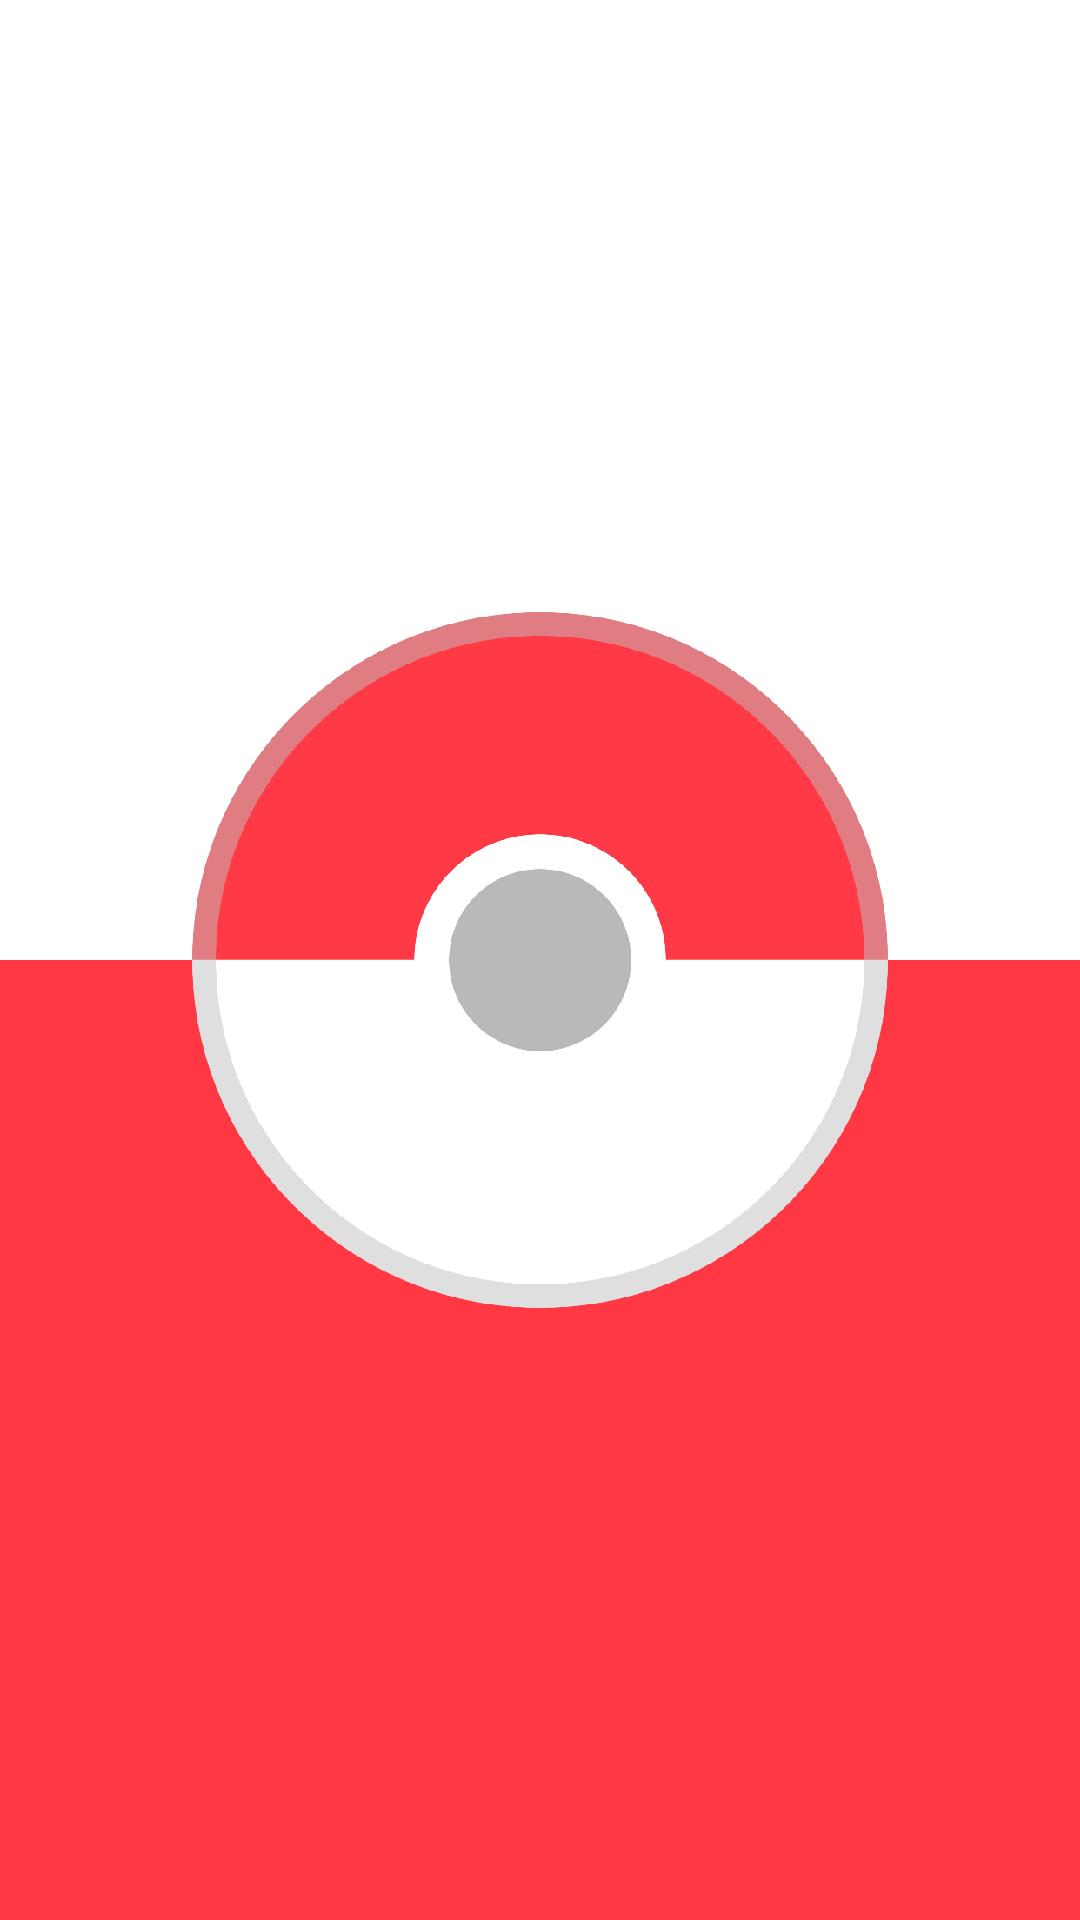 Pokemon Go Pokeball Red Iphone Hd Wallpaper